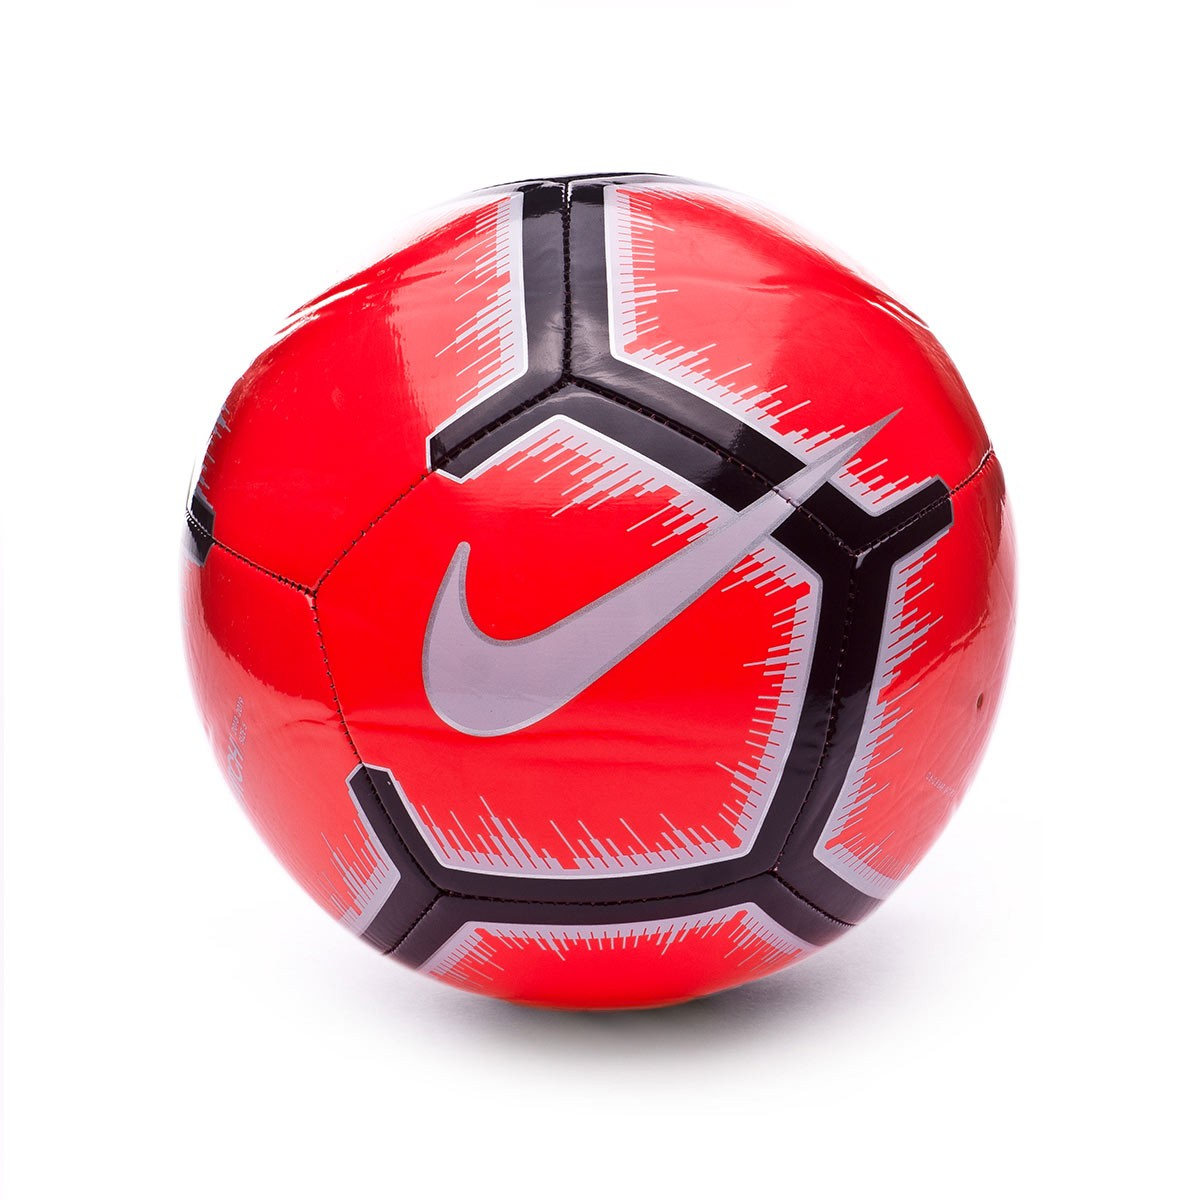 Nike Pitch Training Soccer Ball Ballons entra/înement Football Mixte